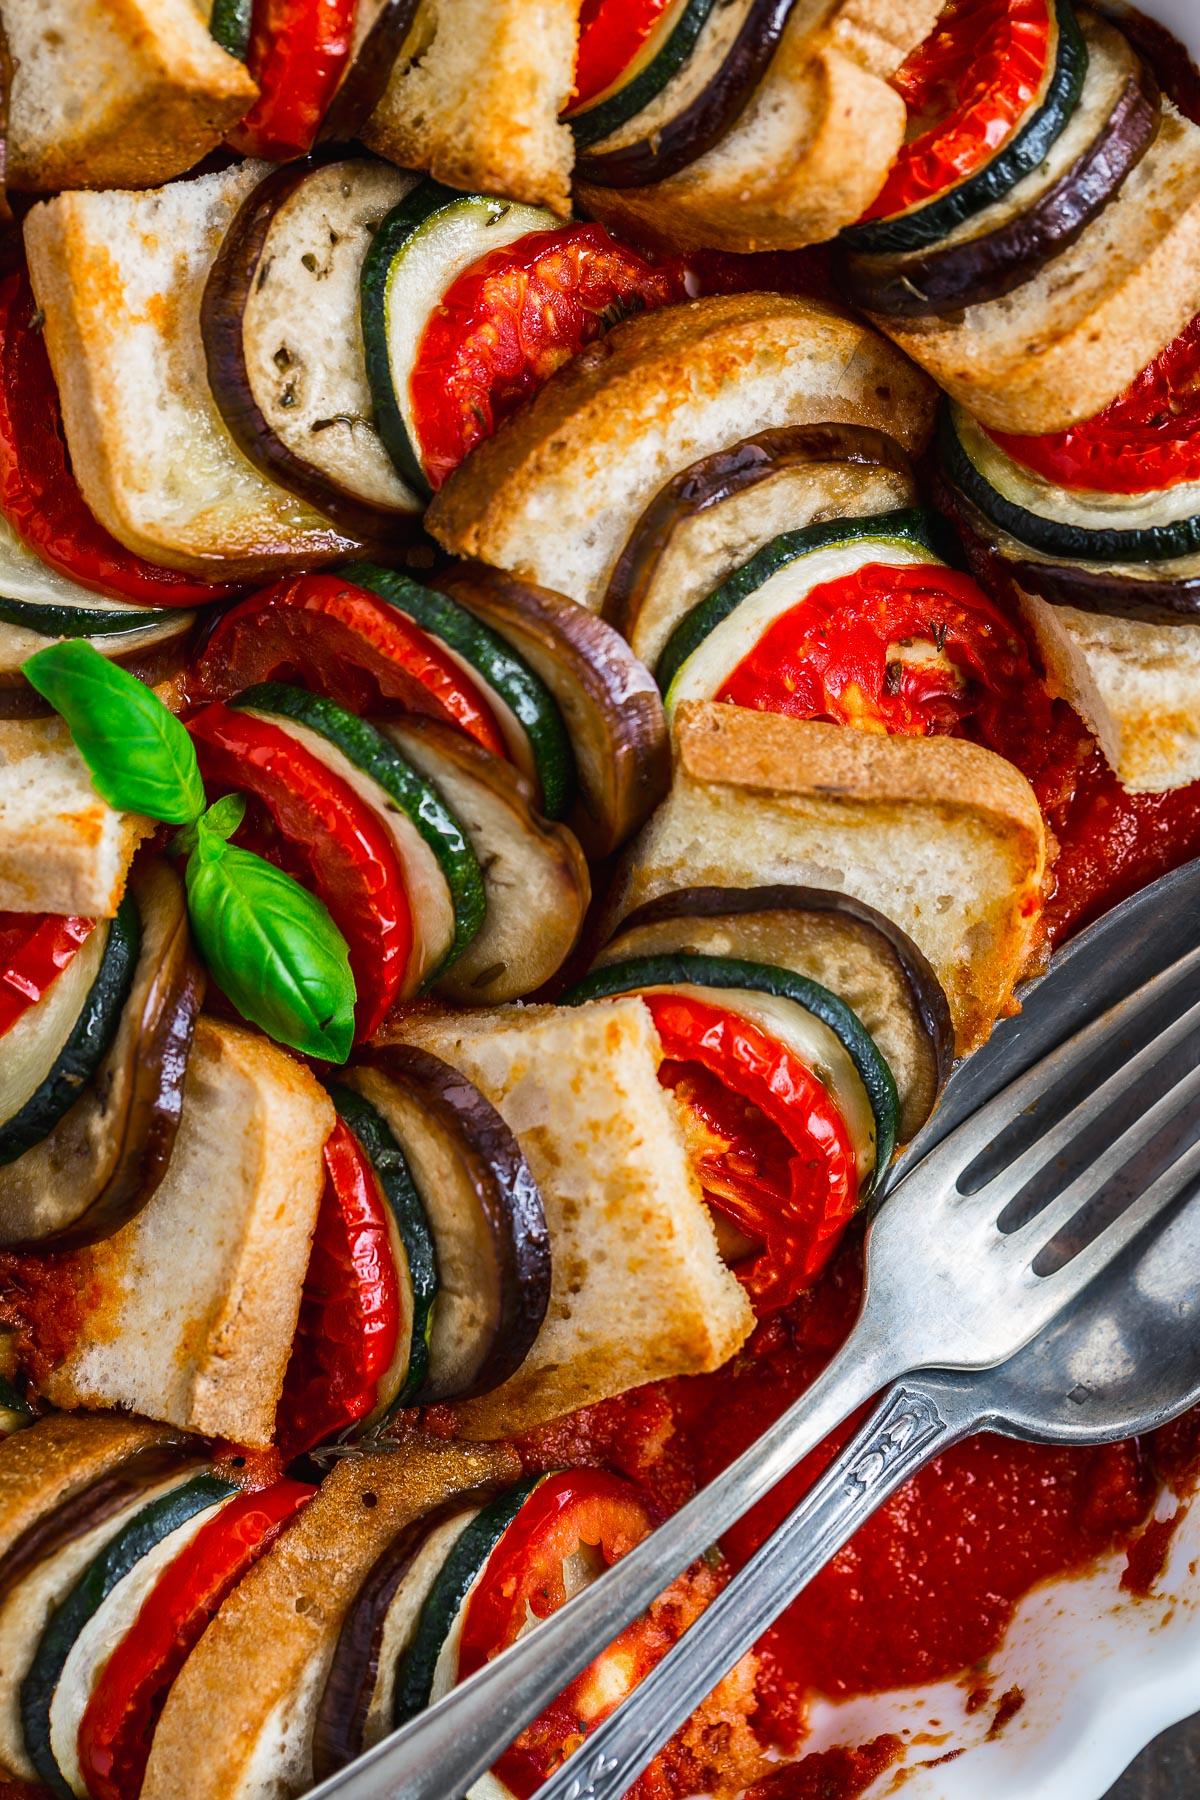 VEGETABLE BREAD RATATOUILLE TIAN recipe #vegan #glutenfree eggplant - TIAN RATATOUILLE di pane senza glutine e verdure